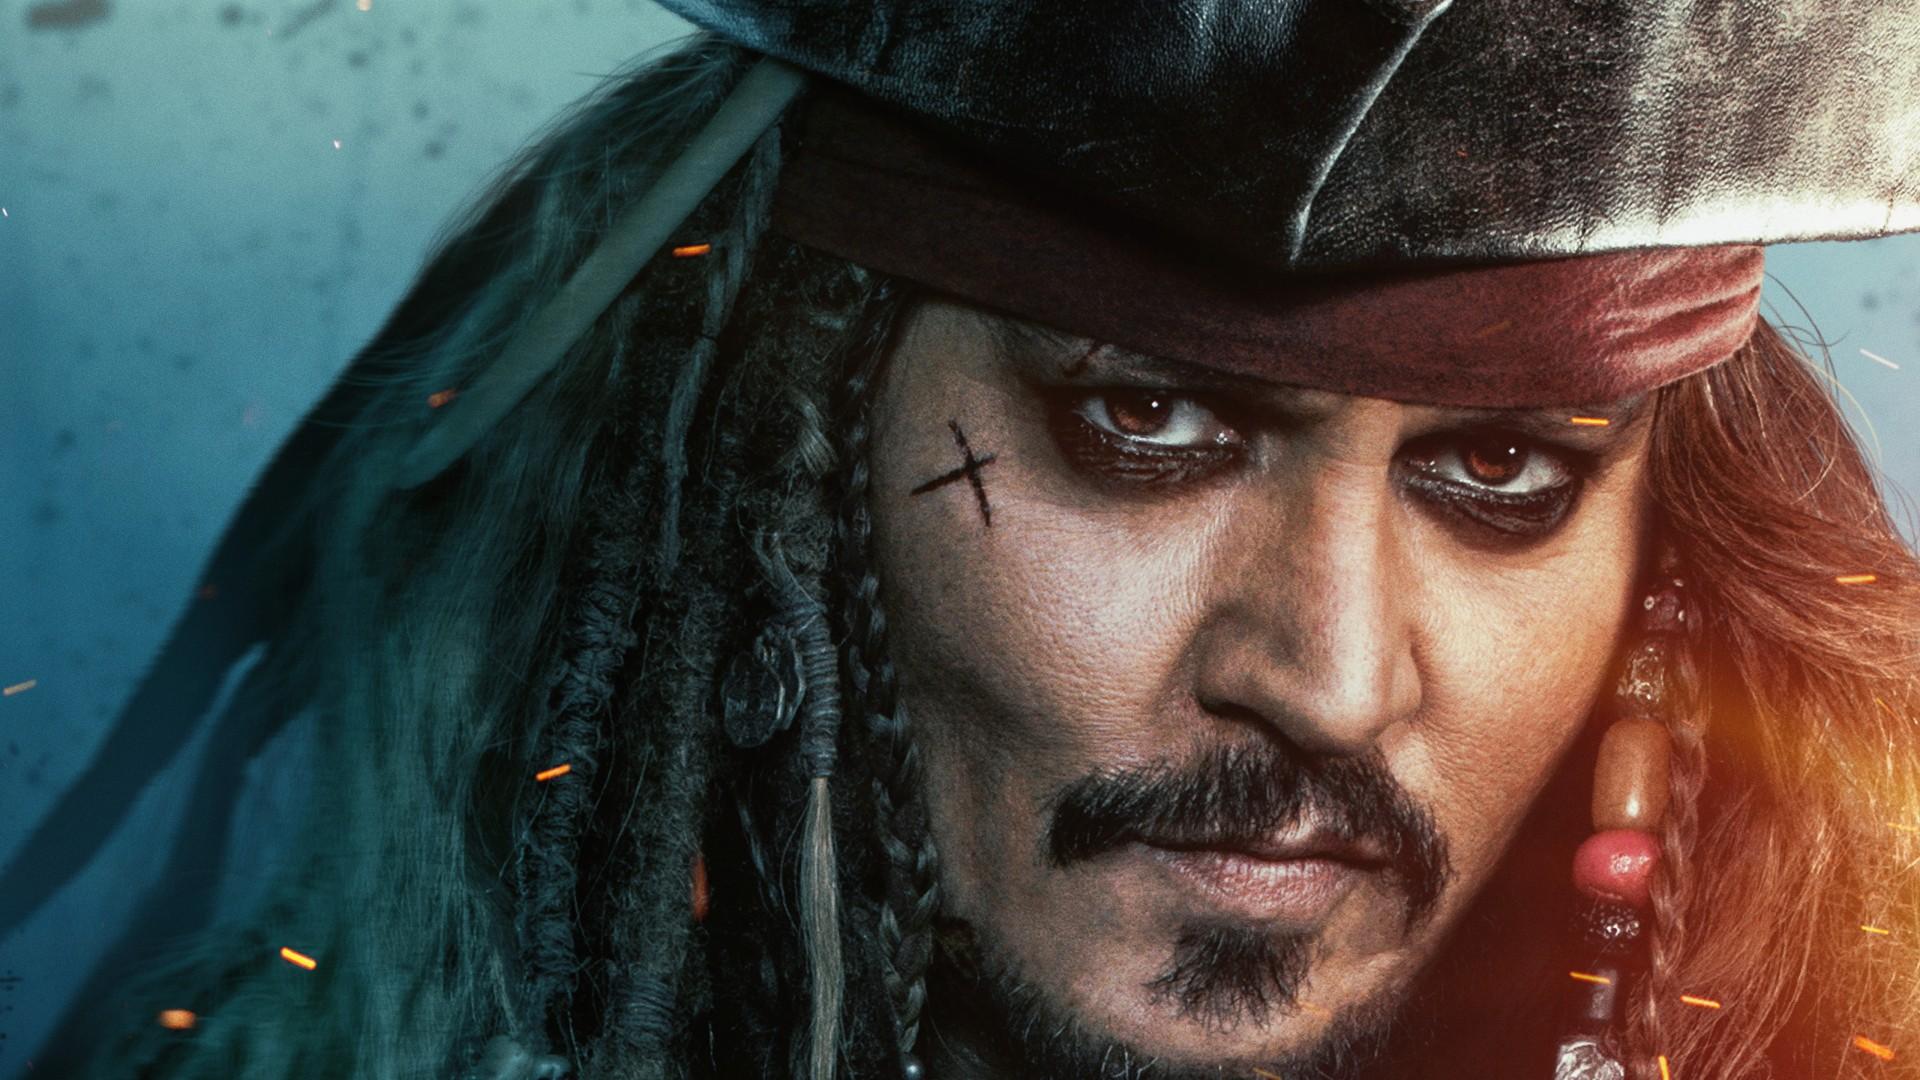 Thor 3d Hd Wallpaper Pirates Of The Caribbean Dead Men Tell No Tales Jack